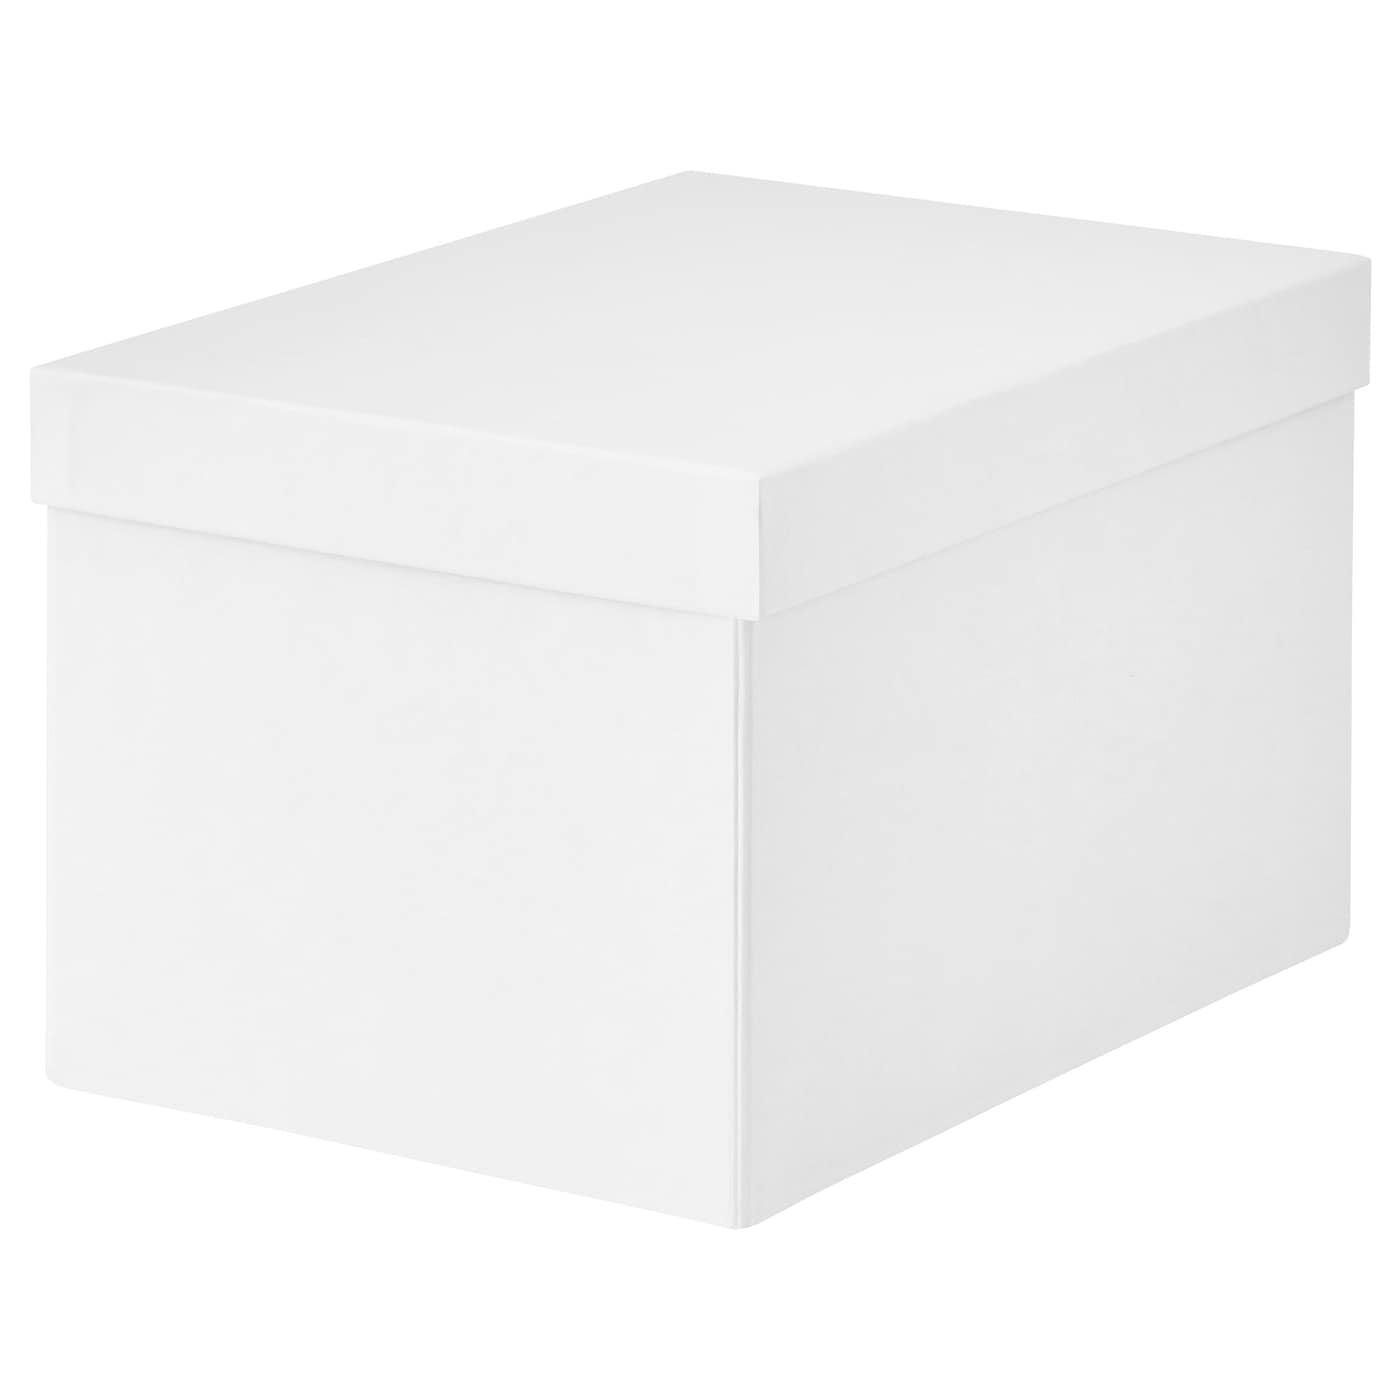 Boite Panier De Rangement Ikea